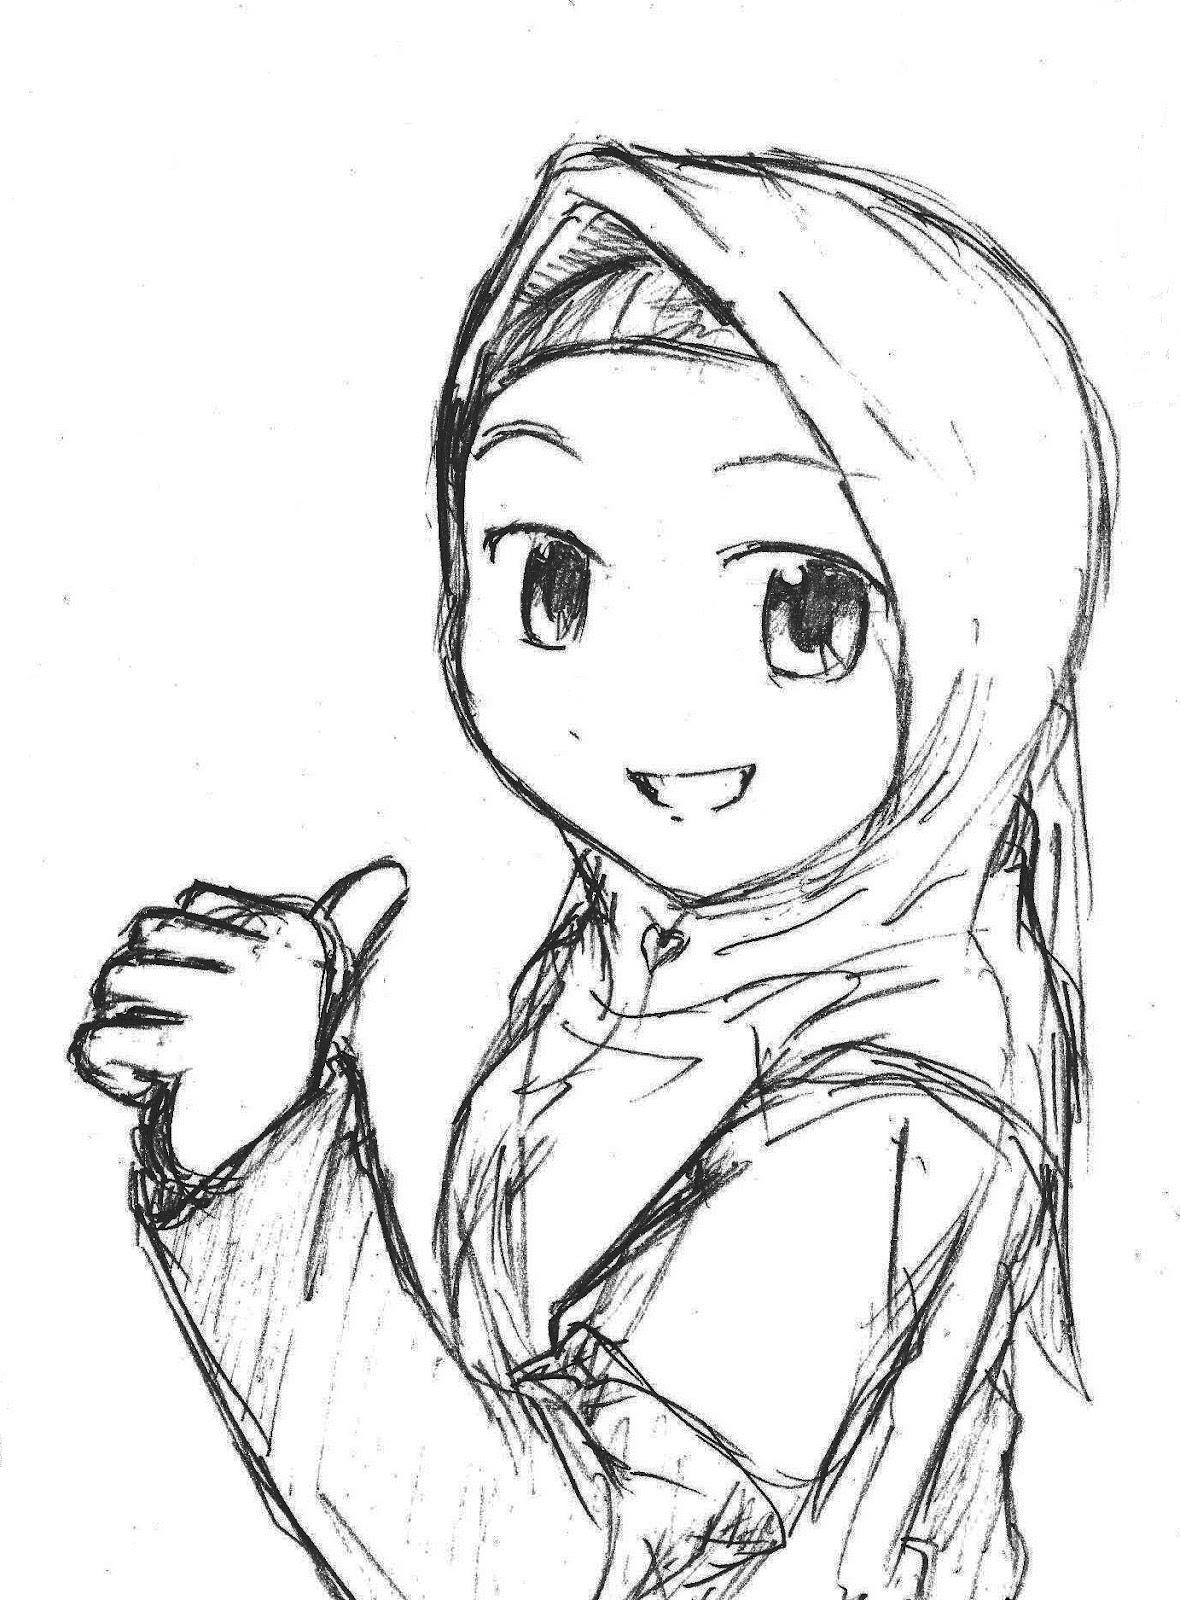 1180x1600 Girl Wearing Hijab Drawing Blackheart's Sketchbook My Sketches